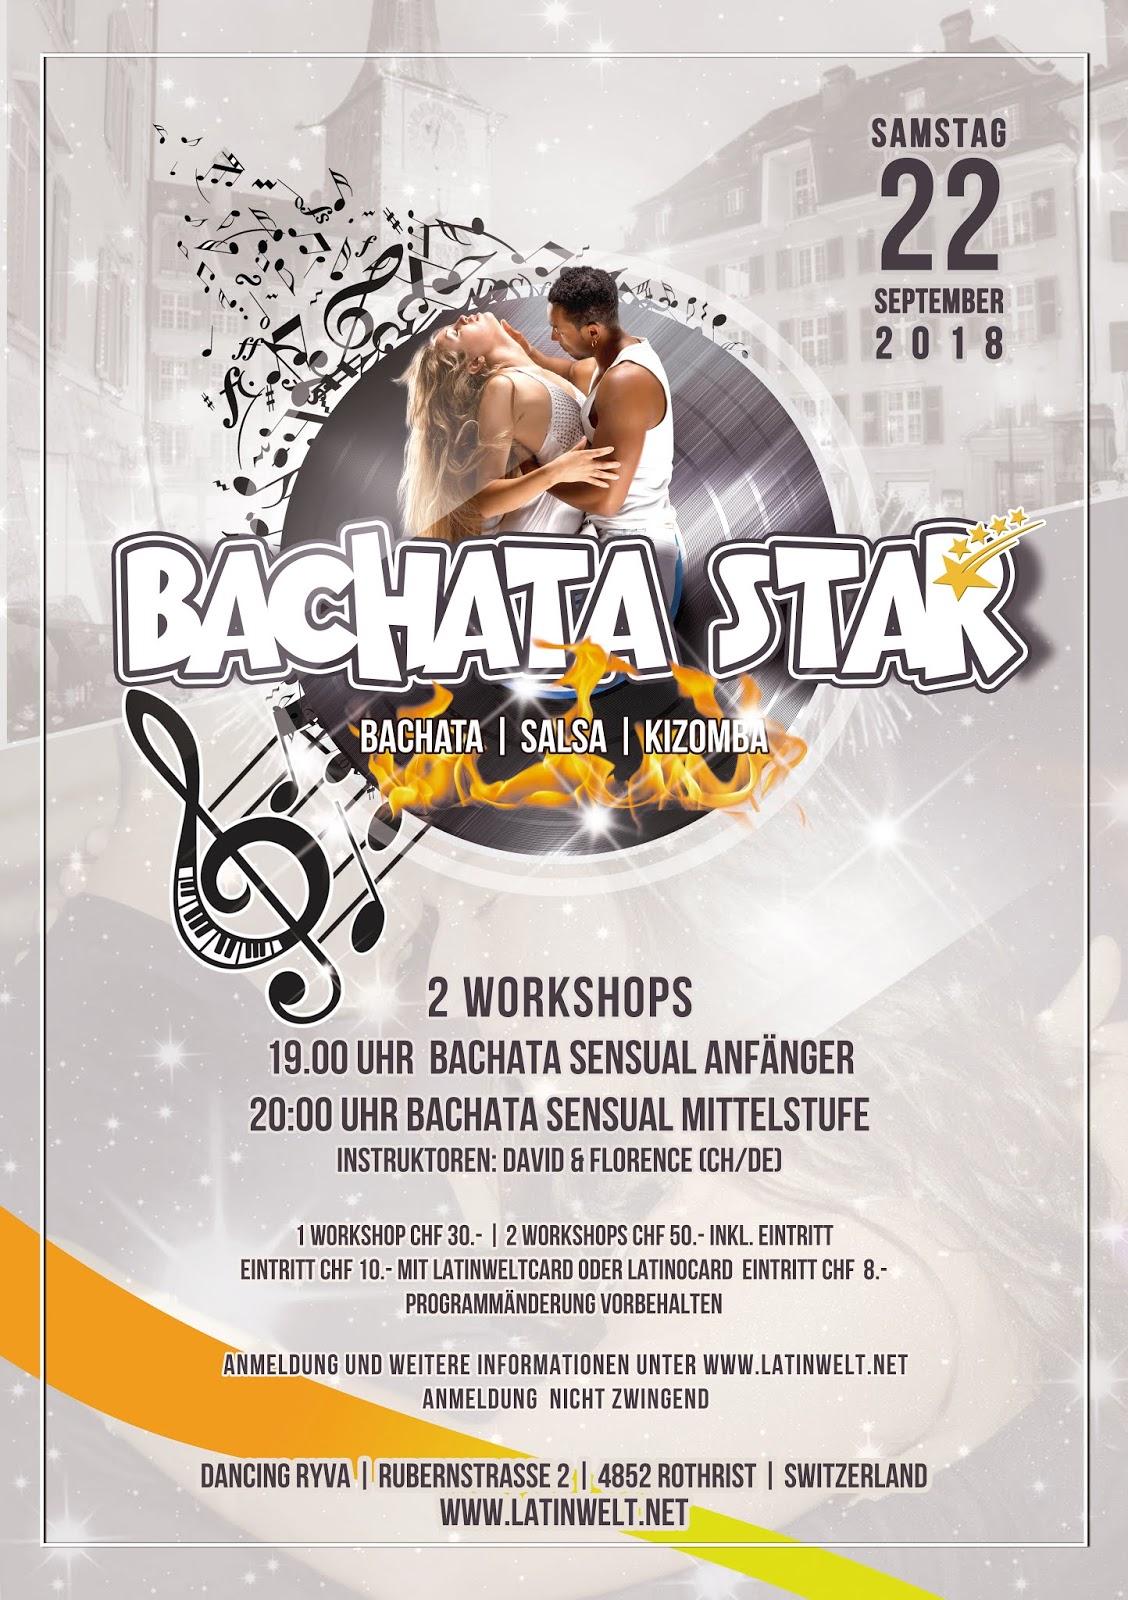 BACHATA STAR